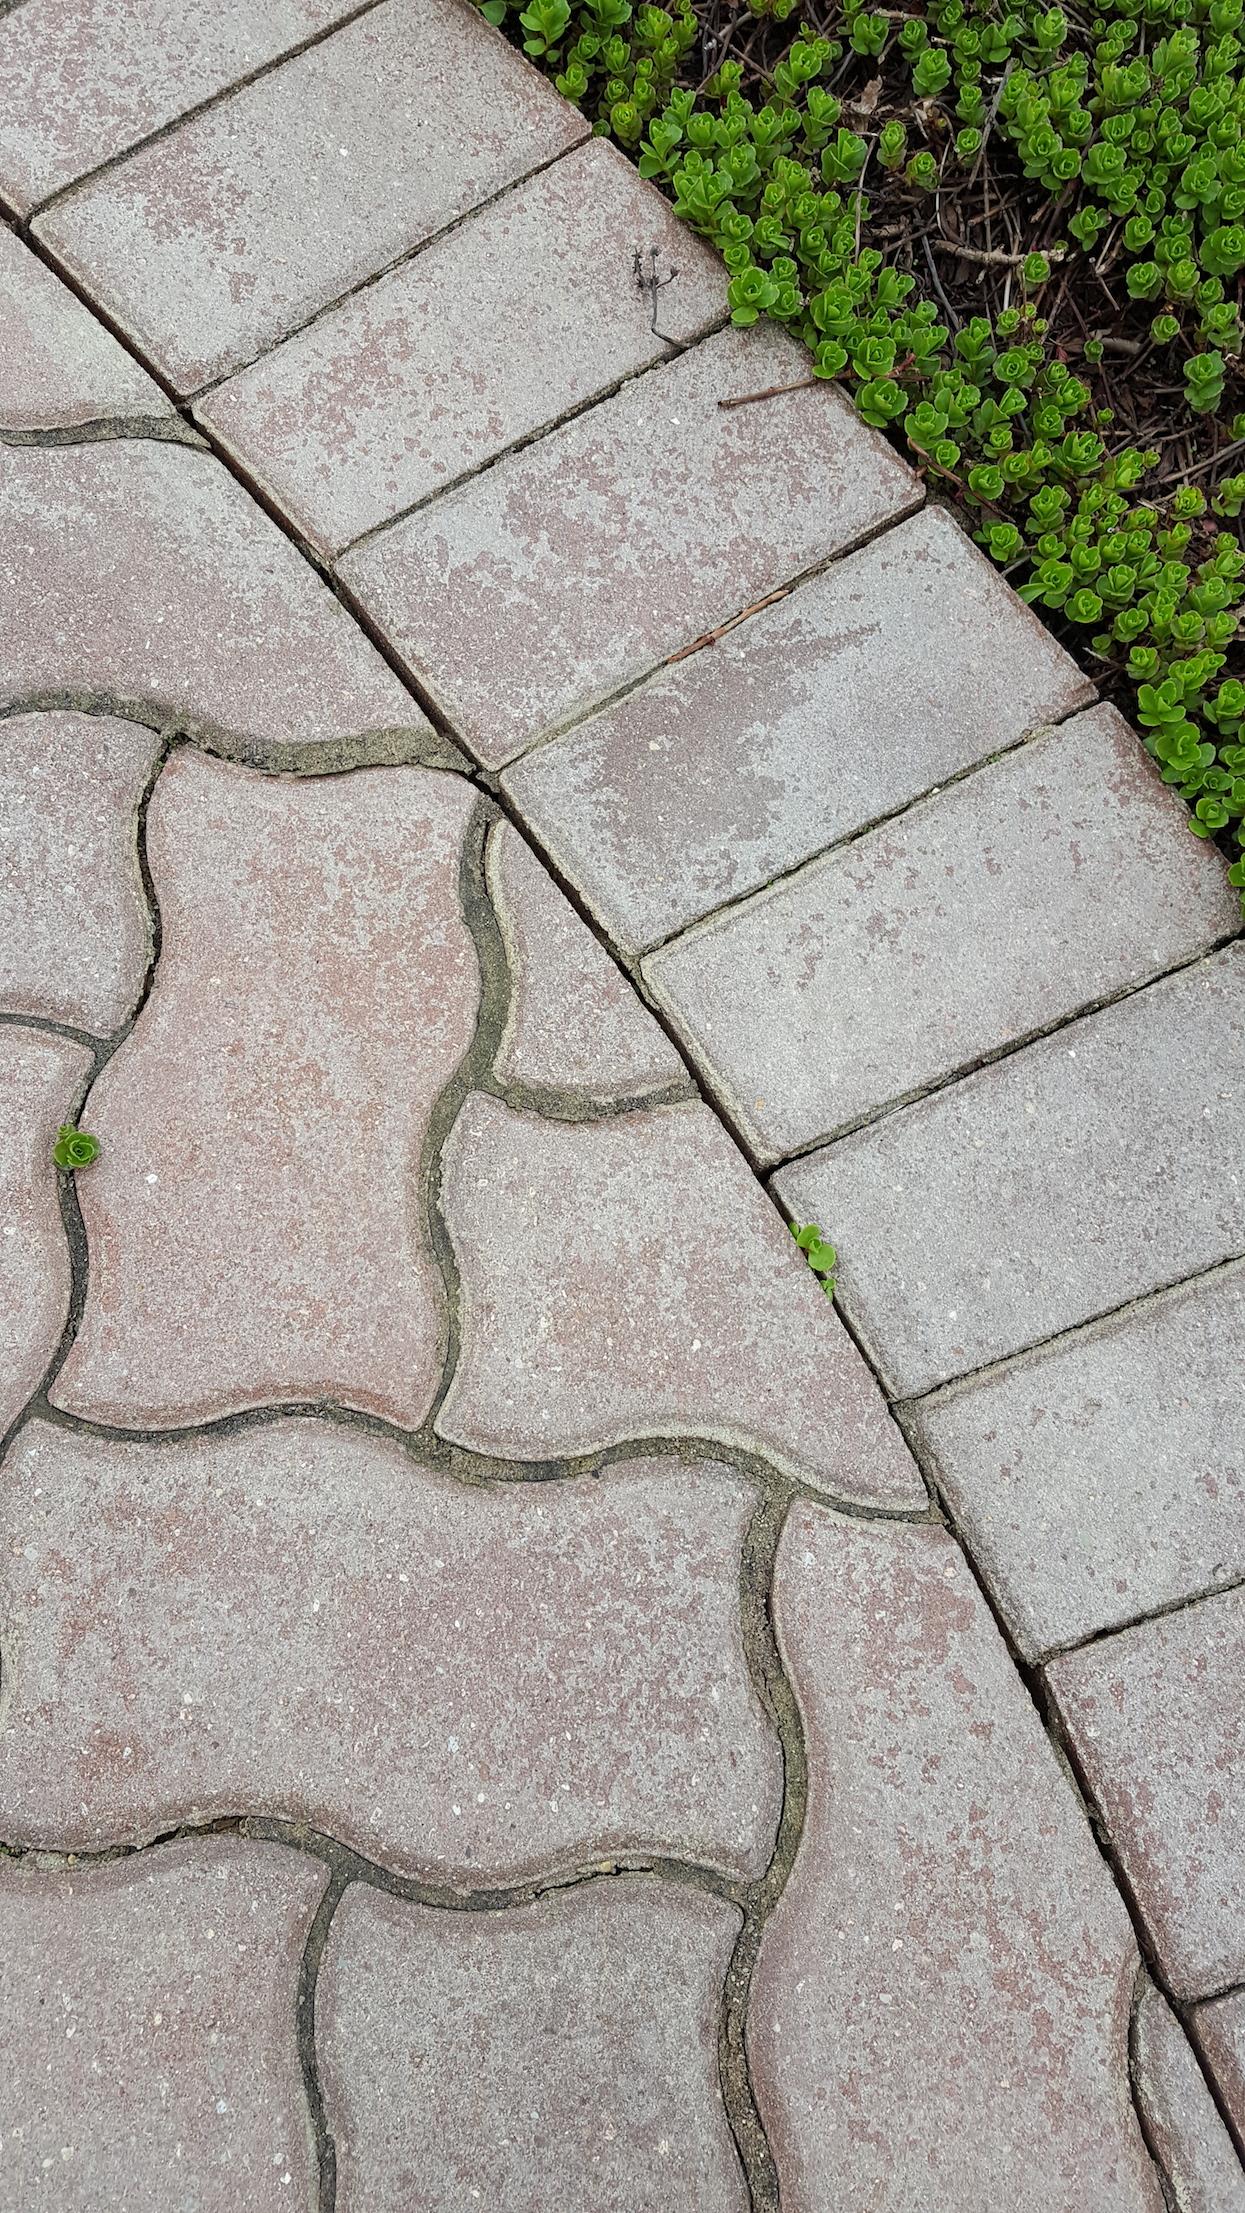 What Does Failing Brick Paver Sealer